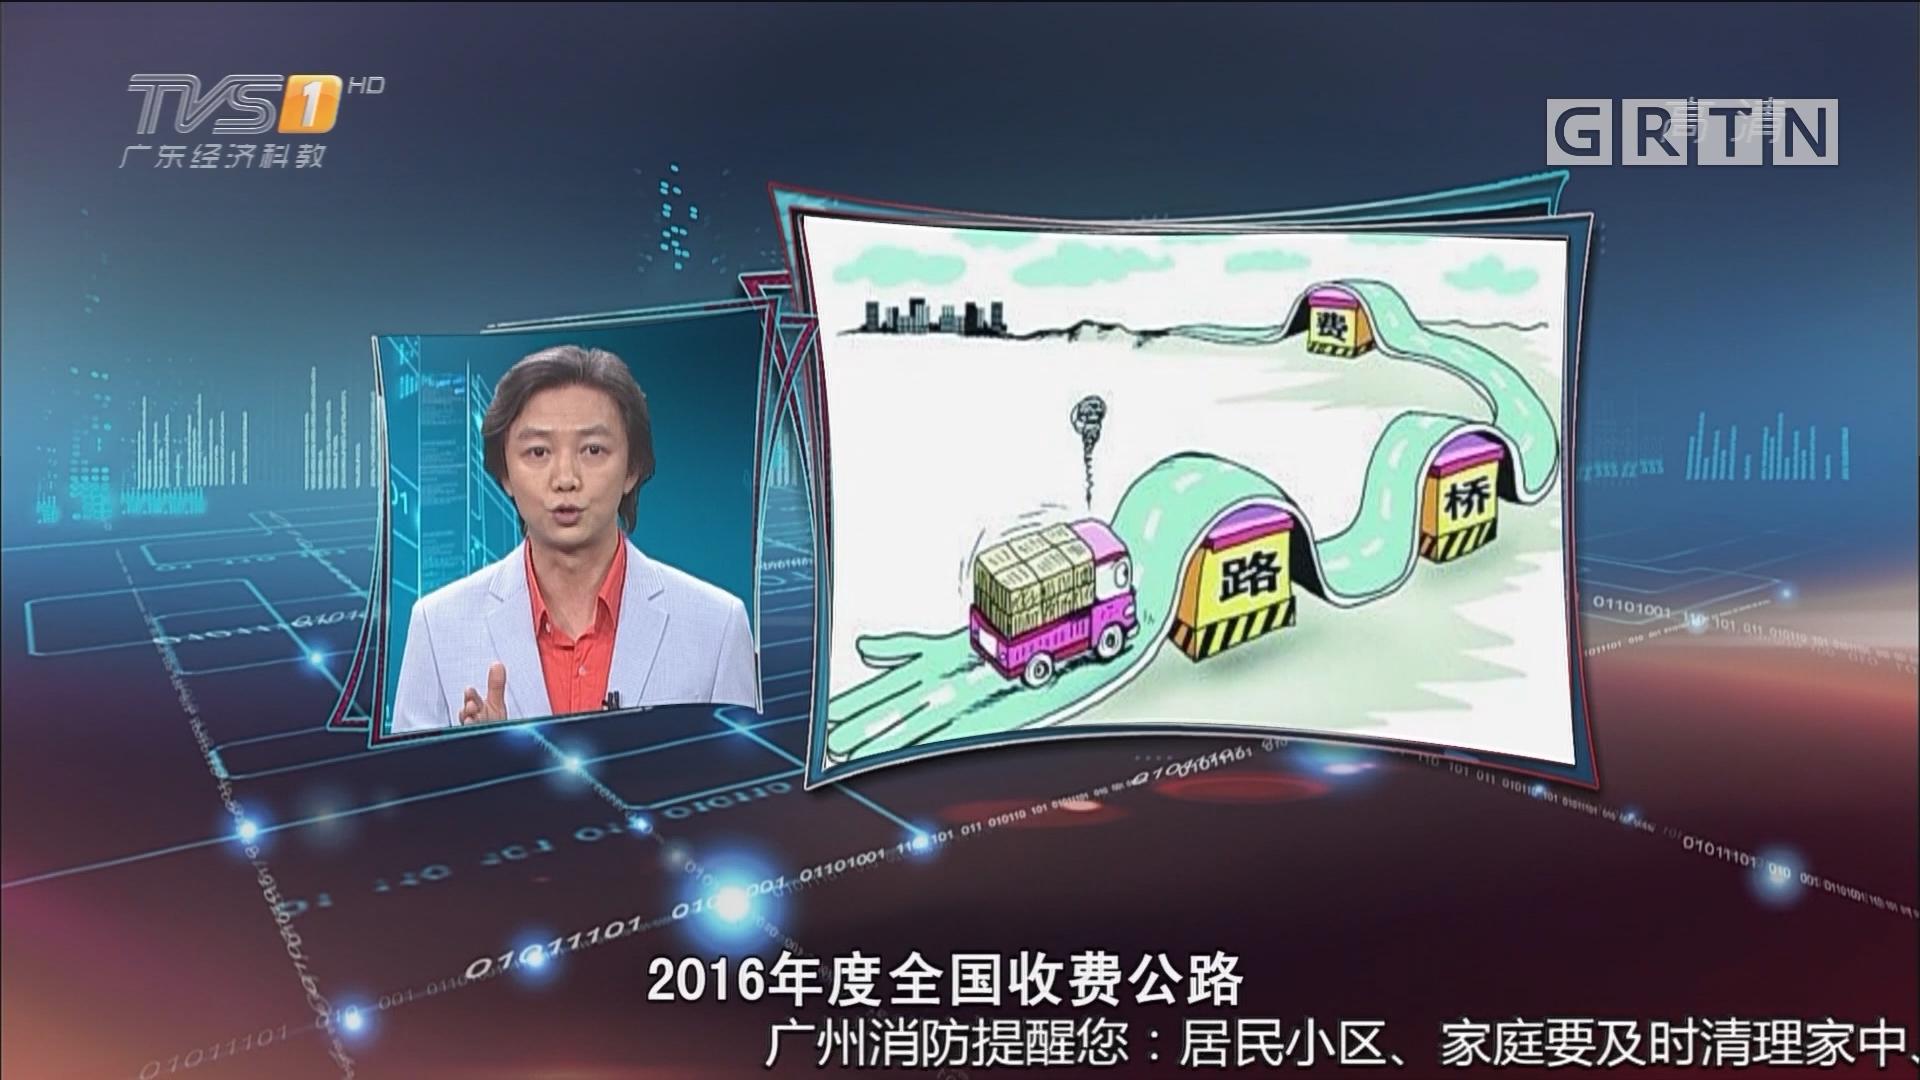 [HD][2018-03-08]马后炮:收费公路改革 前些年推进缓慢 障碍在哪?